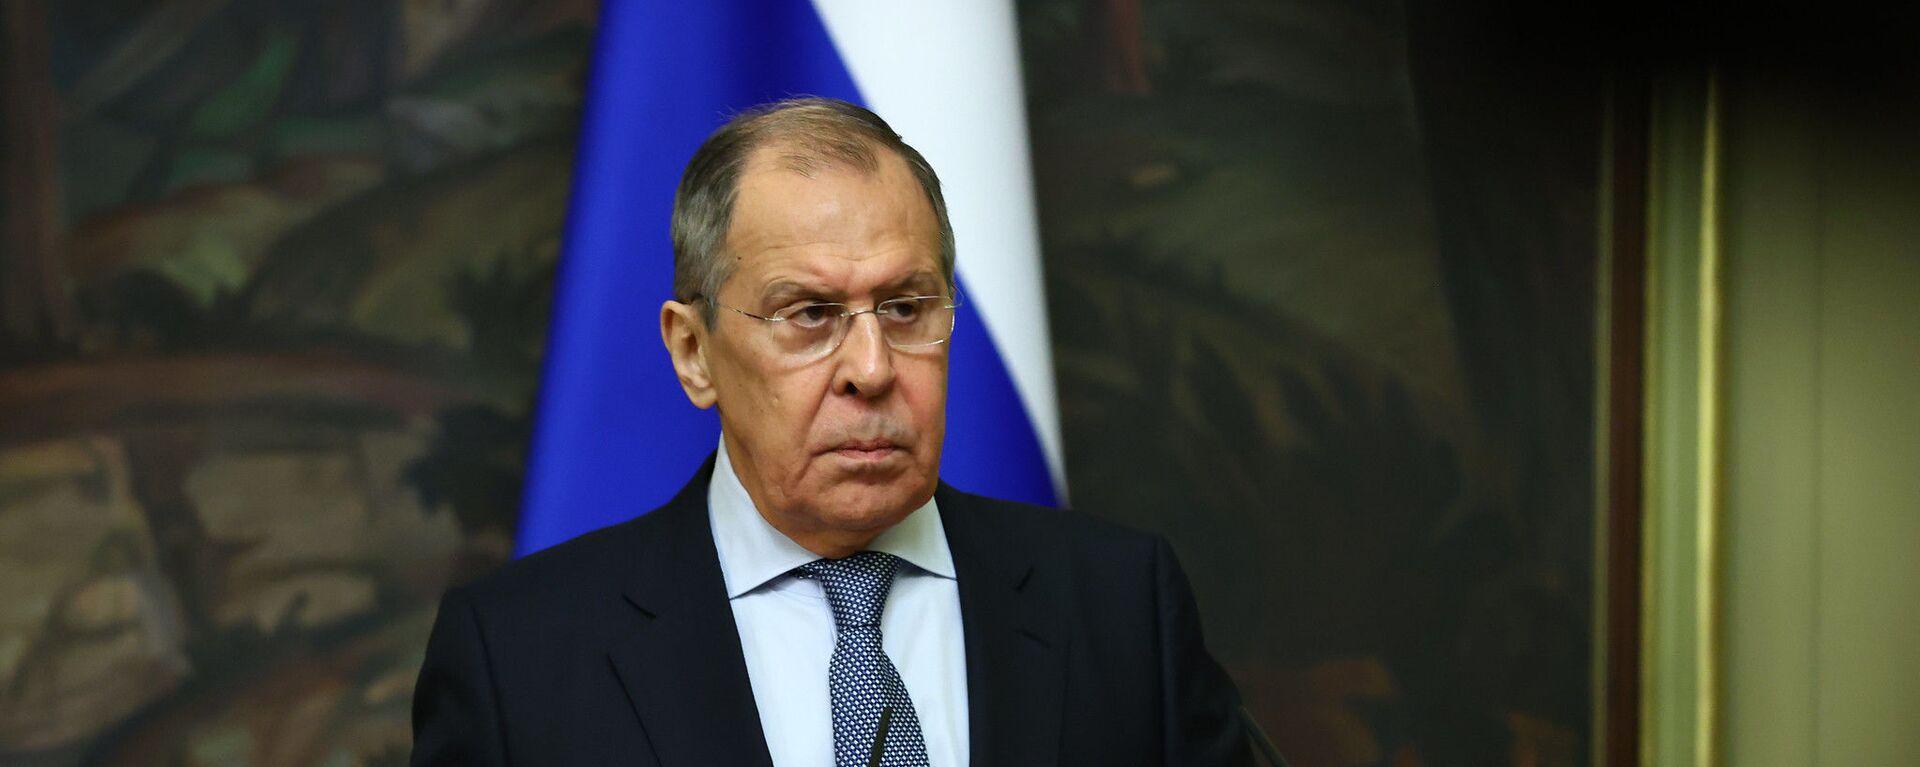 Ruský ministr zahraničí Sergej Lavrov - Sputnik Česká republika, 1920, 06.04.2021